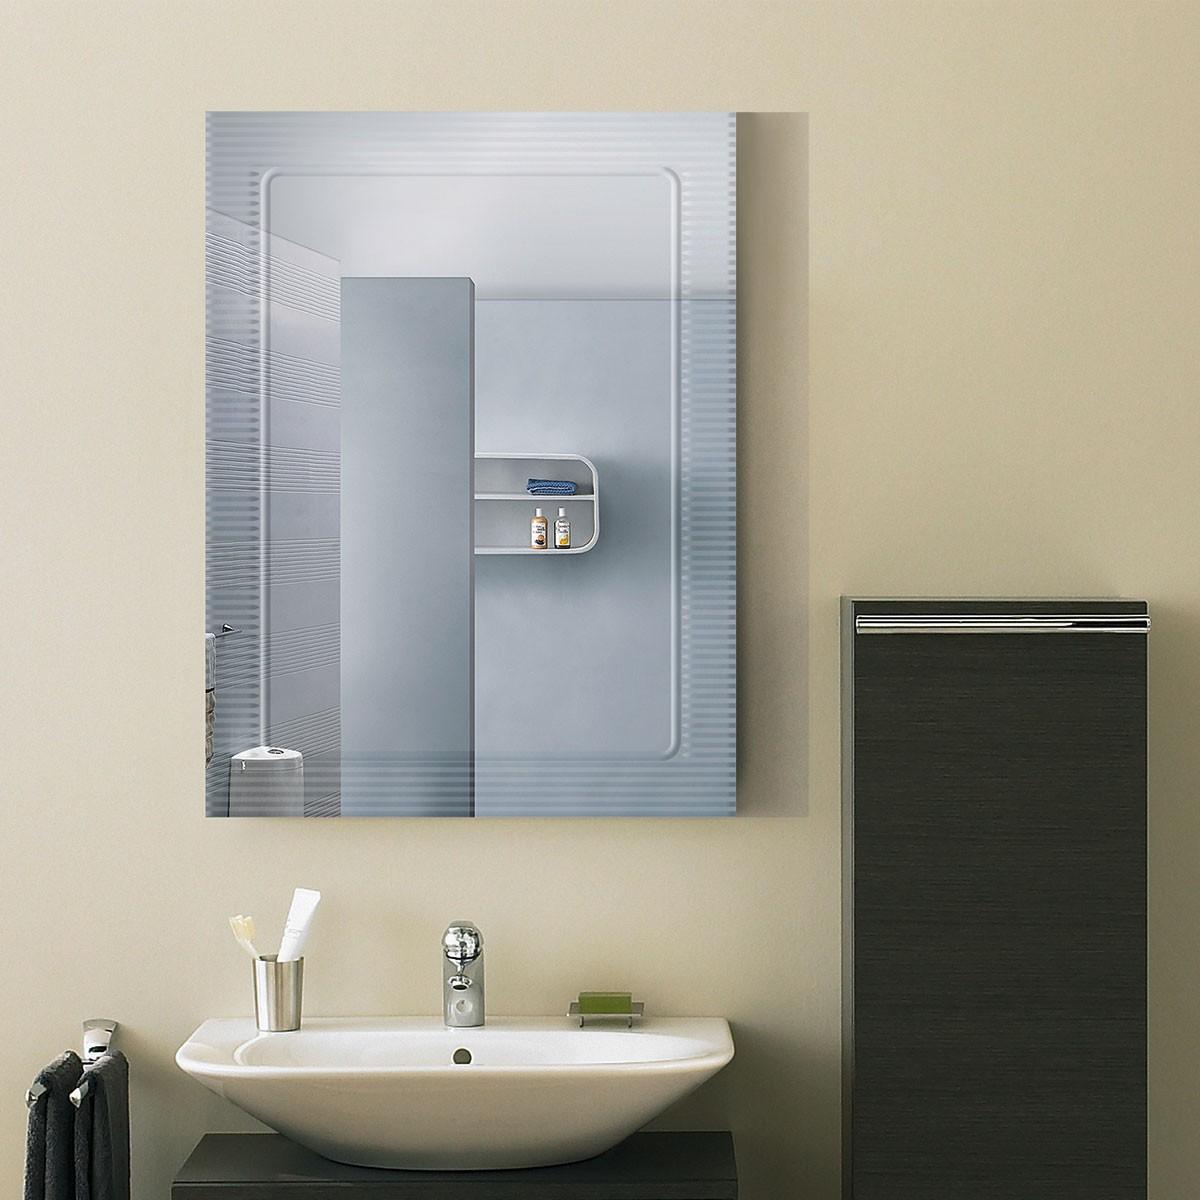 24 x 18 in wall mounted rectangle bathroom mirror dk od b067c decoraport usa